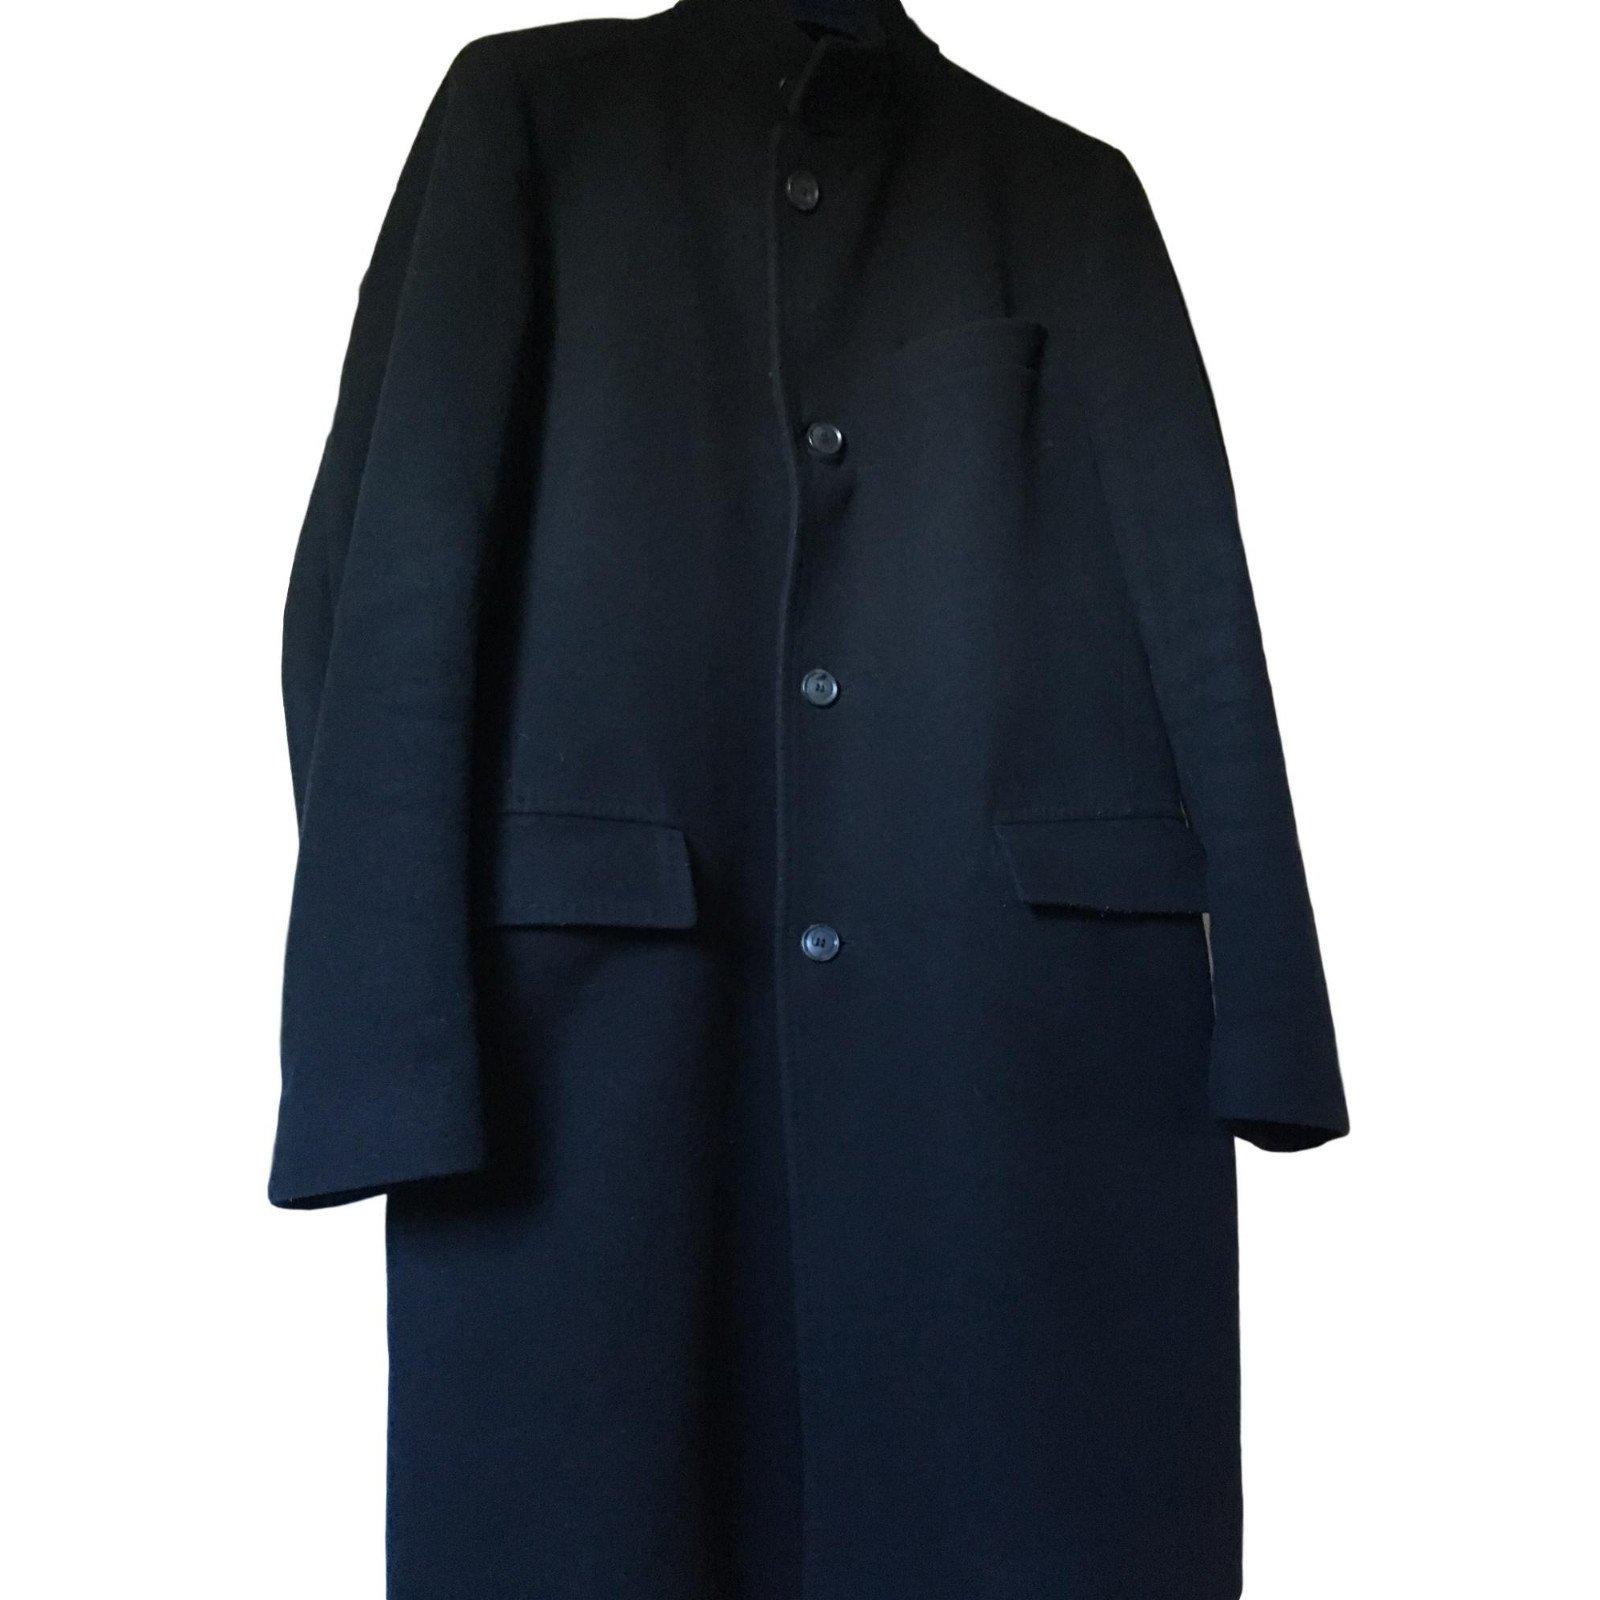 manteaux homme hugo boss automne hiver coton bleu marine. Black Bedroom Furniture Sets. Home Design Ideas